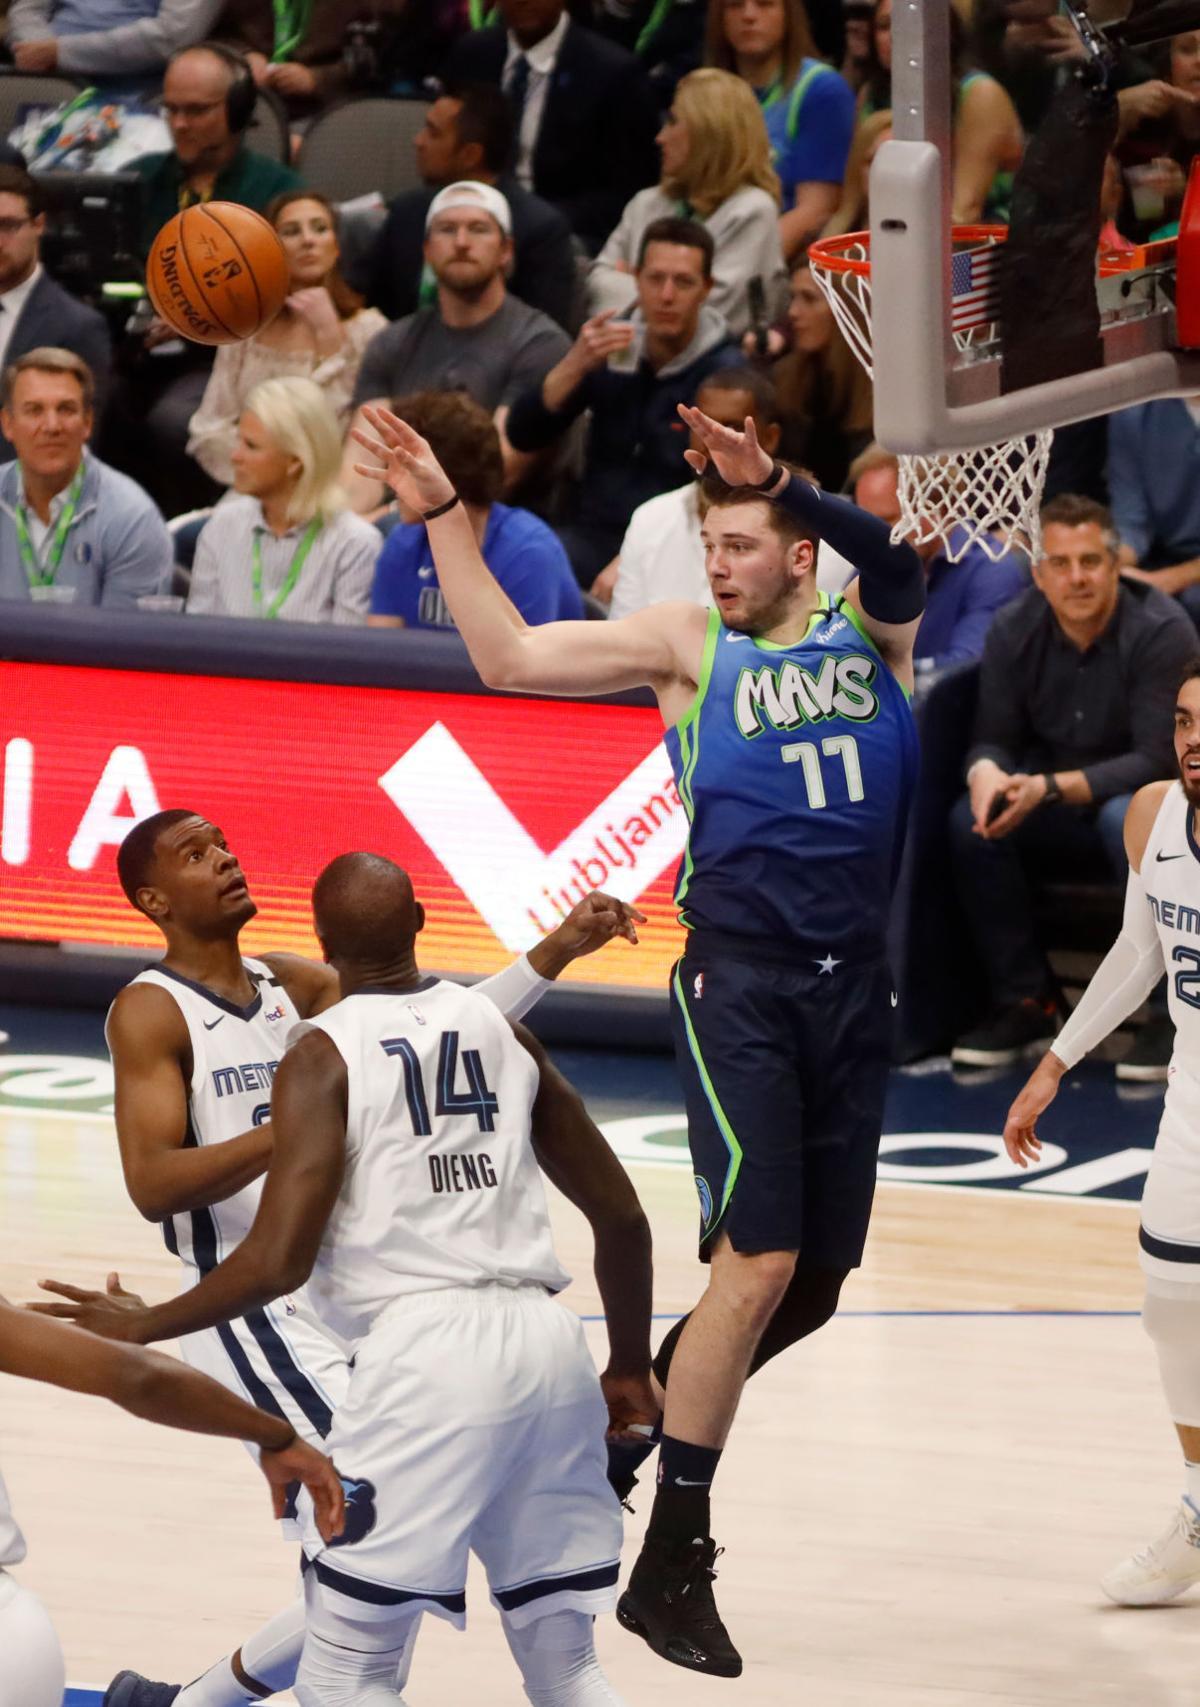 Dallas Mavericks close out win over Memphis Grizzlies during UTA Night at the Mavericks